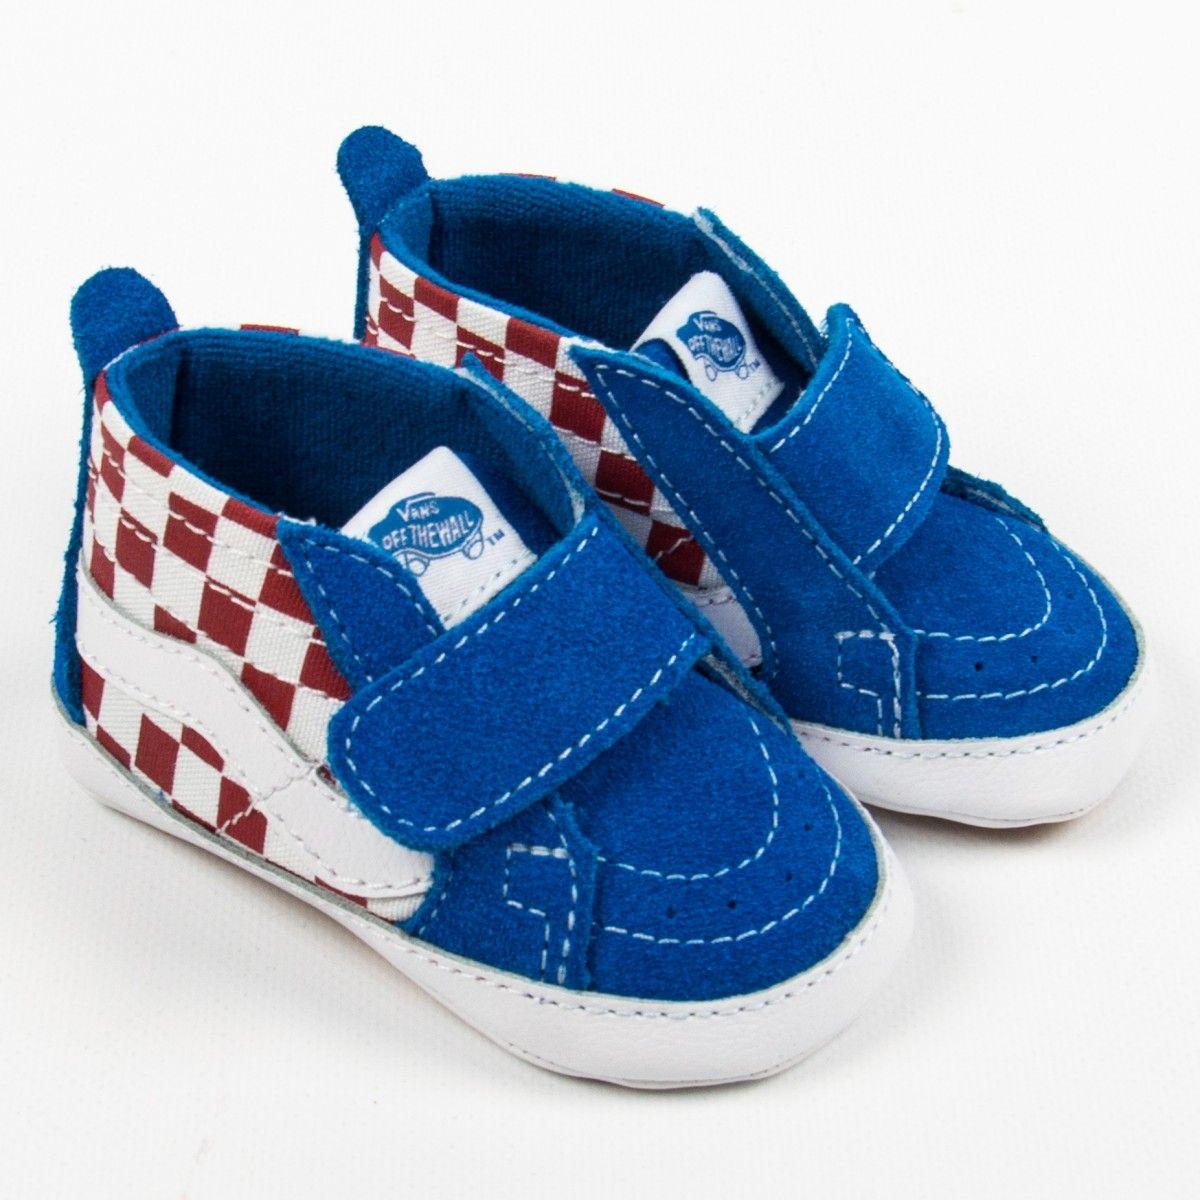 "6a5fbb6c54 Vans ""Sk8-Hi Crib"" blaue Sneakers mit rotem Checkerboard-Muster ..."